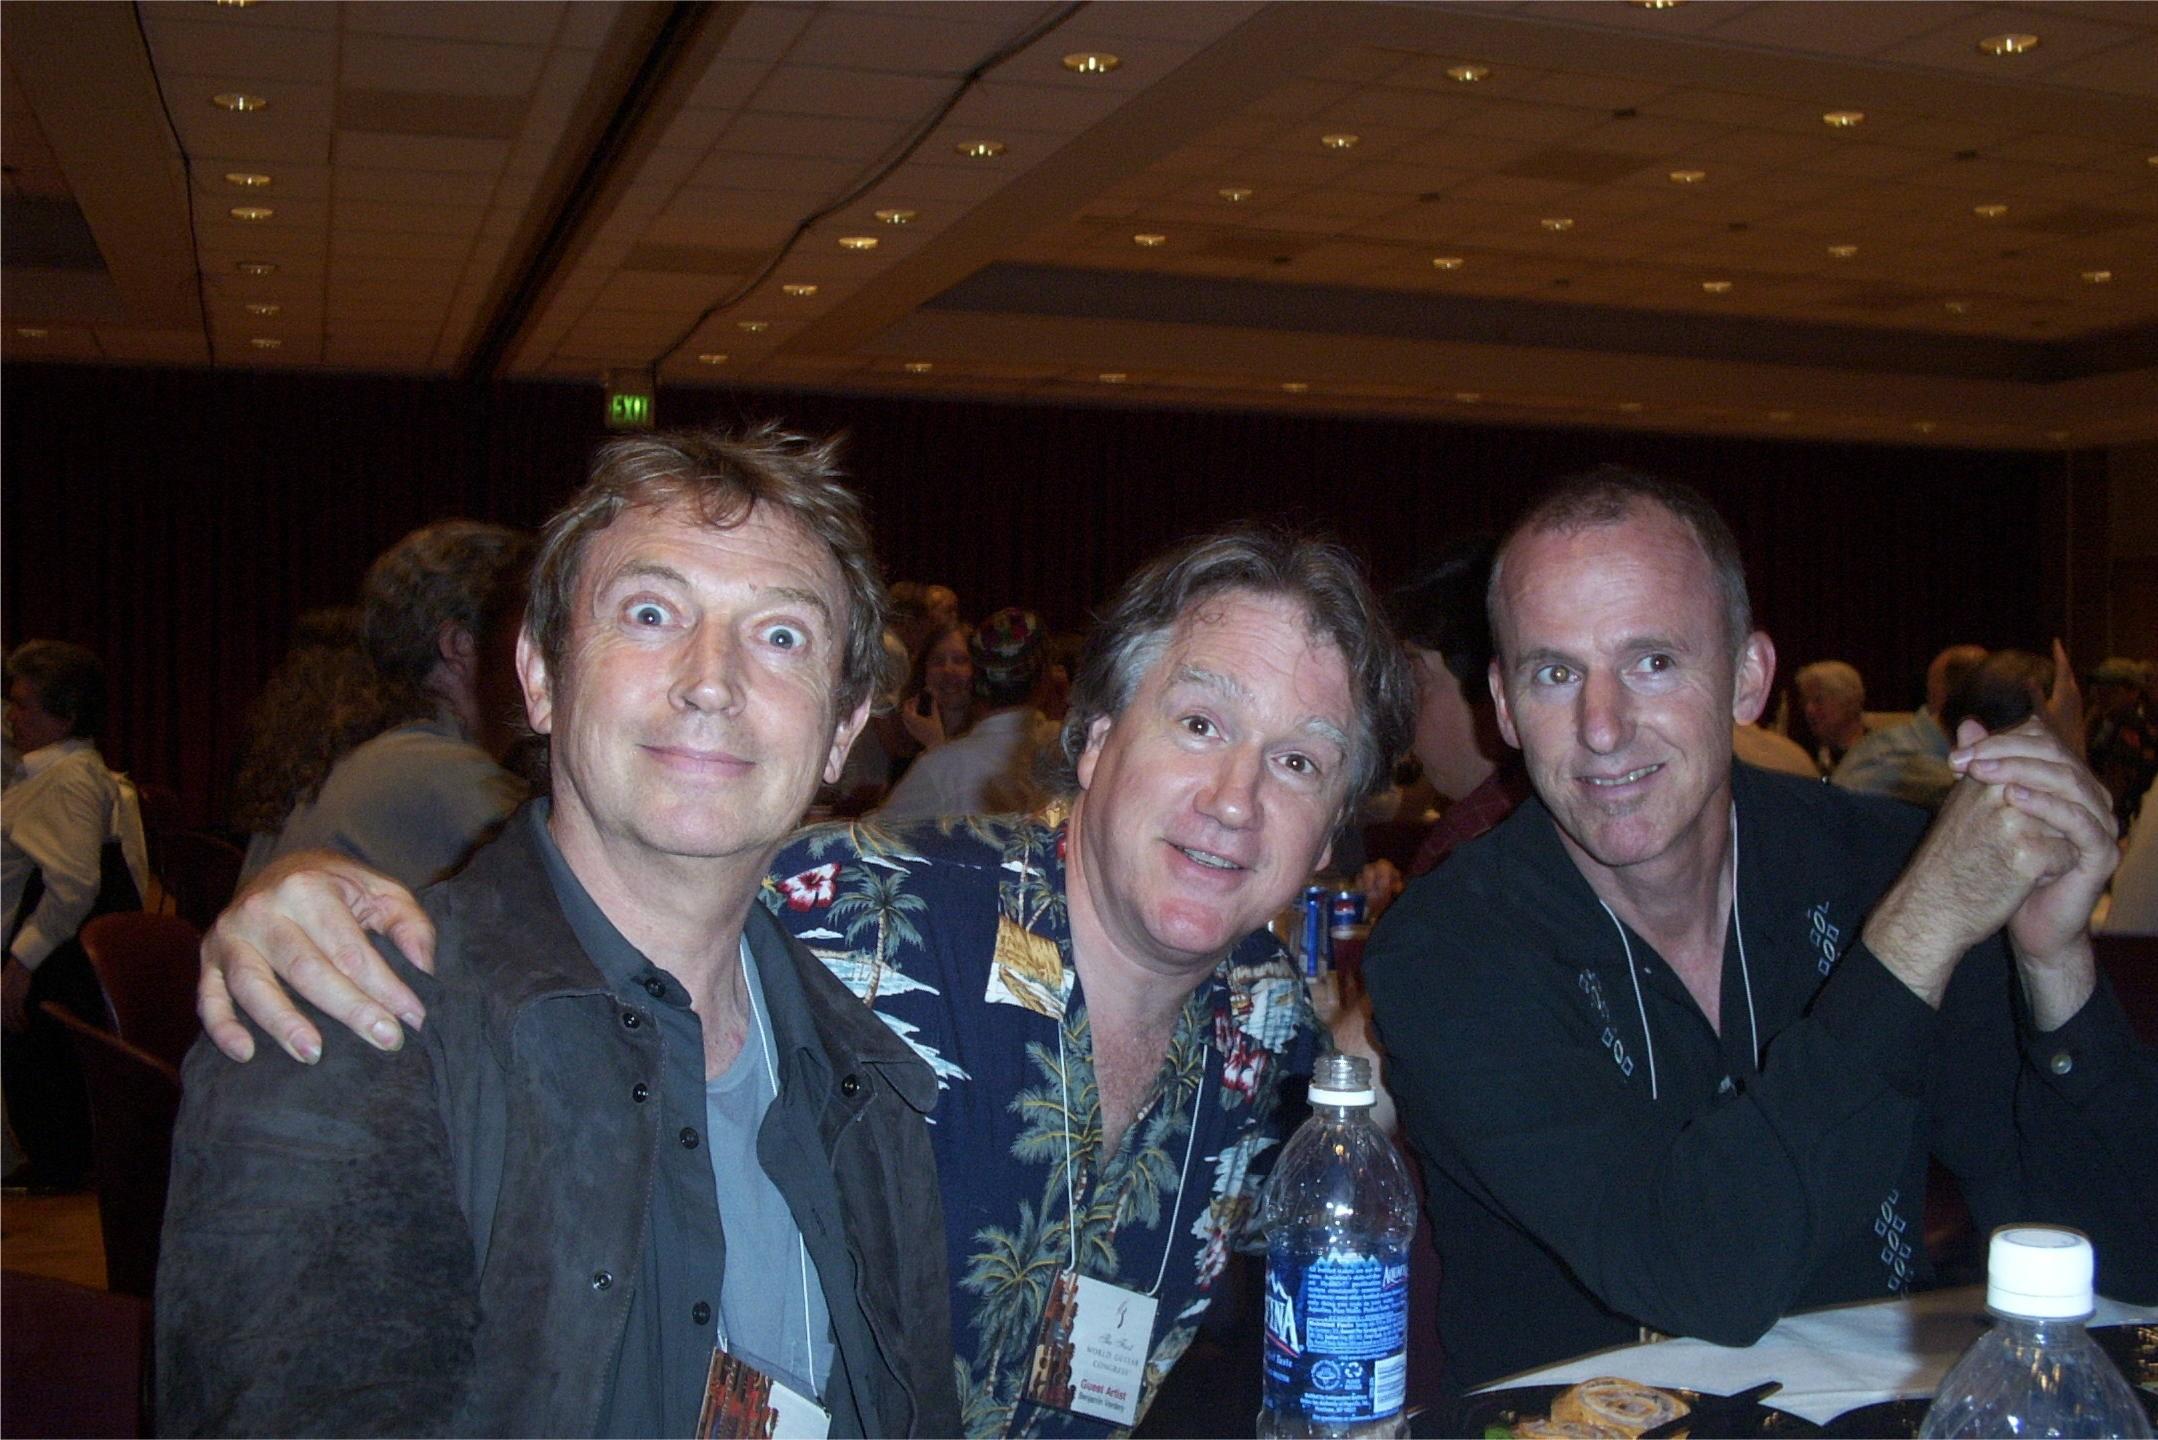 Andy Summers, Ben, John Dearman